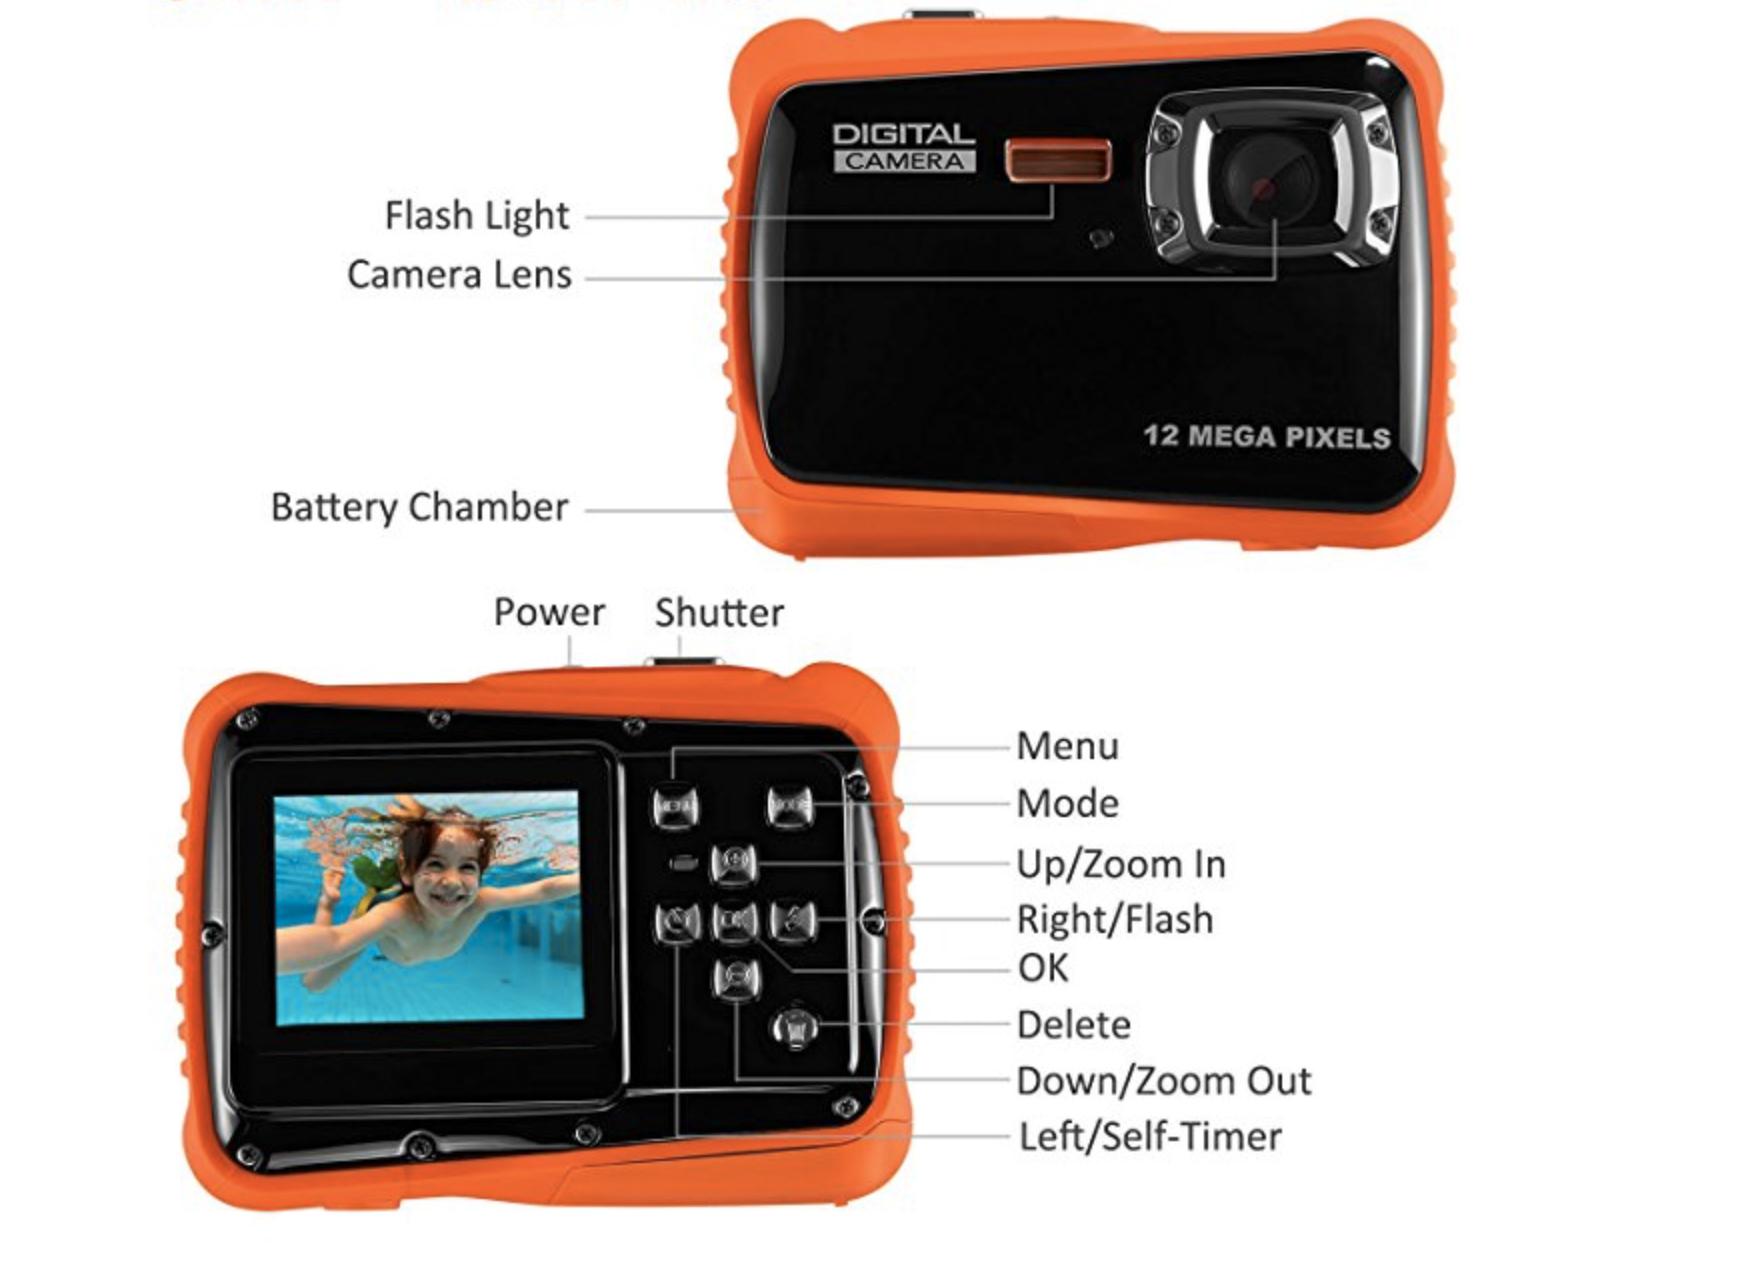 orange digital camera for kids